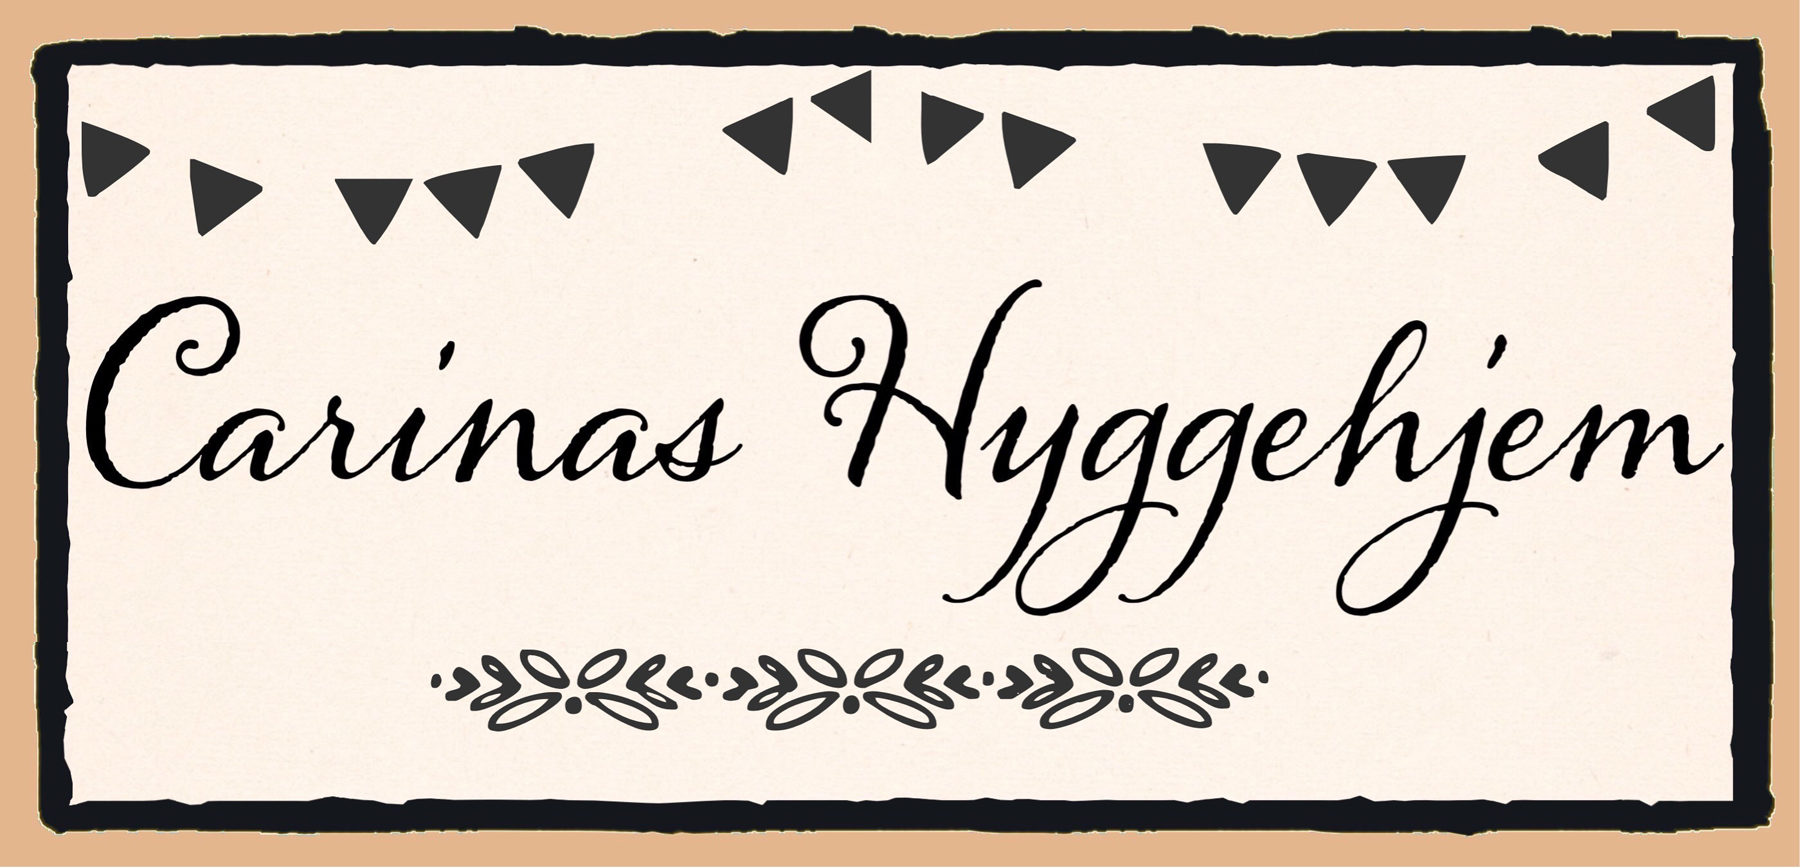 Carinas Hyggehjem